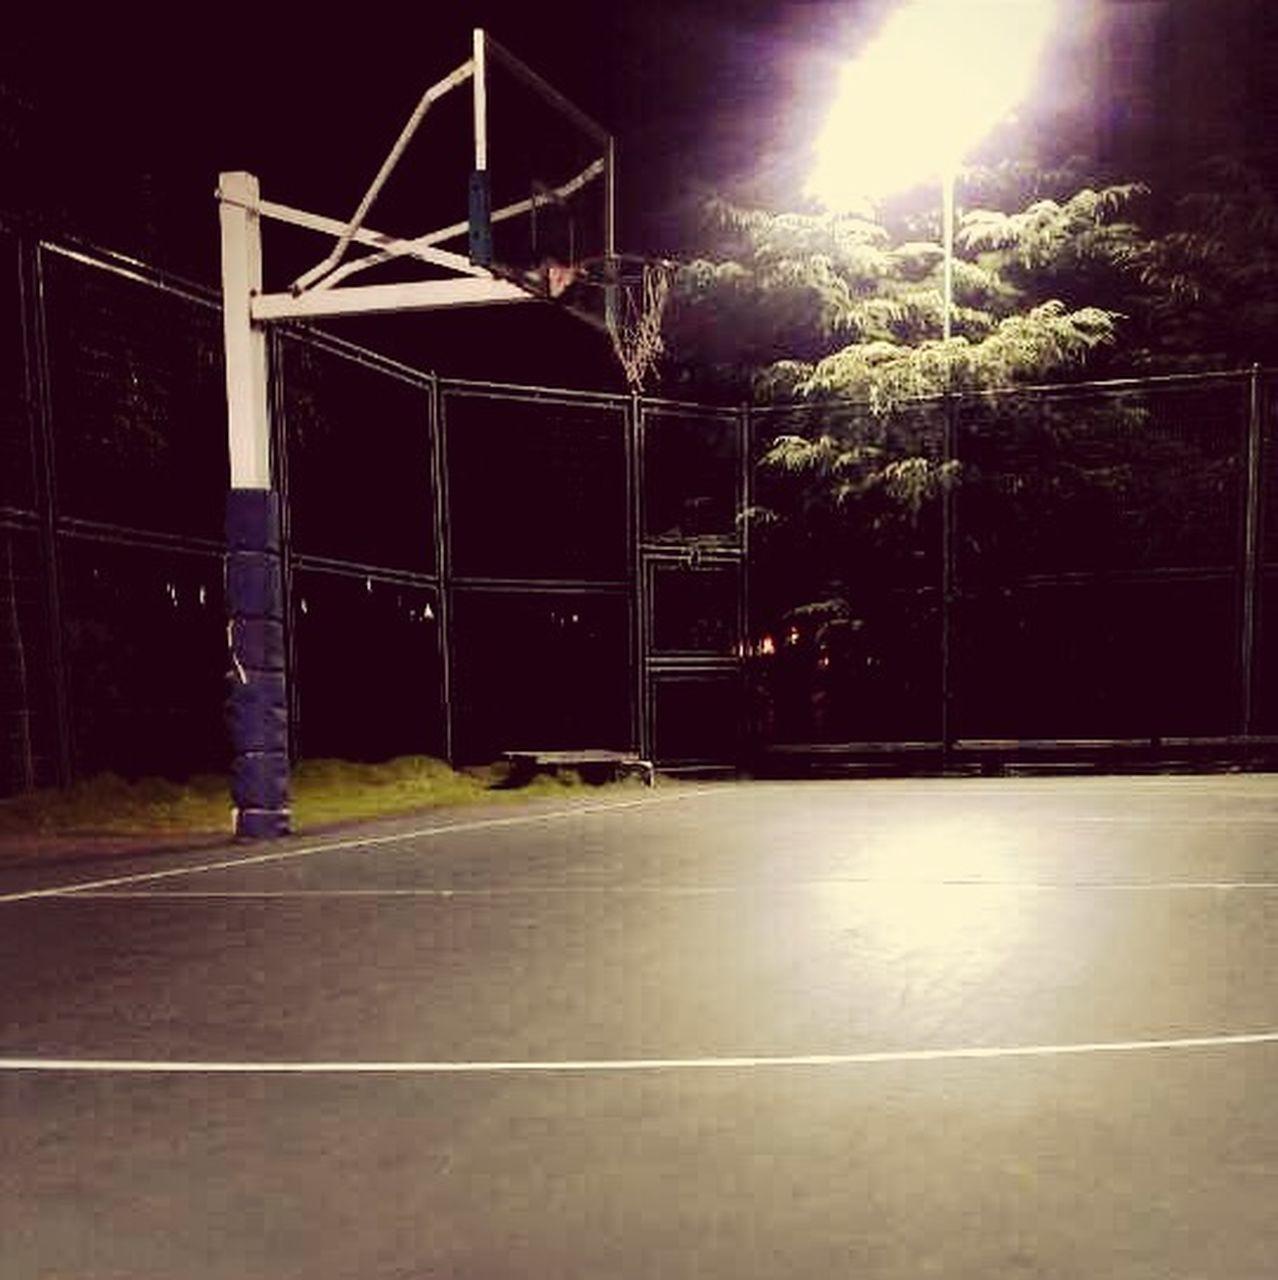 illuminated, night, no people, outdoors, court, sky